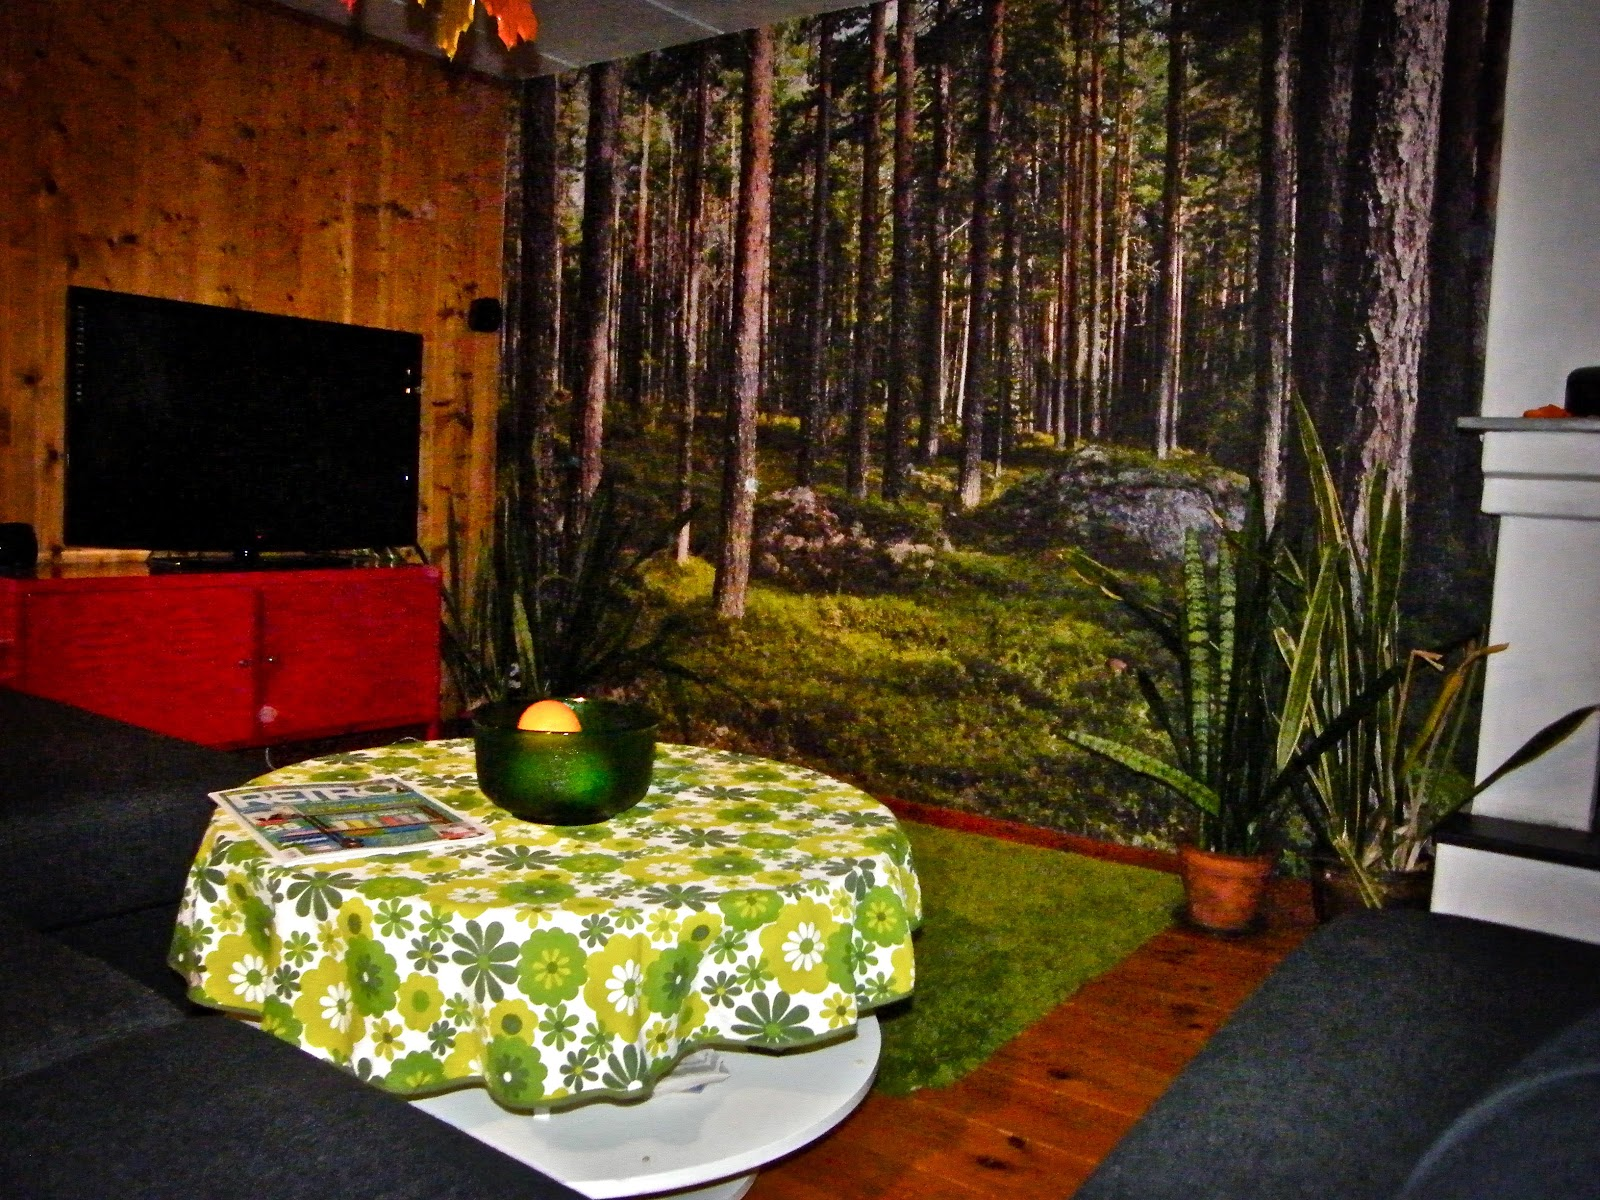 Gillestuga   ett vardagsrum i källaren   ungdomar.se forum